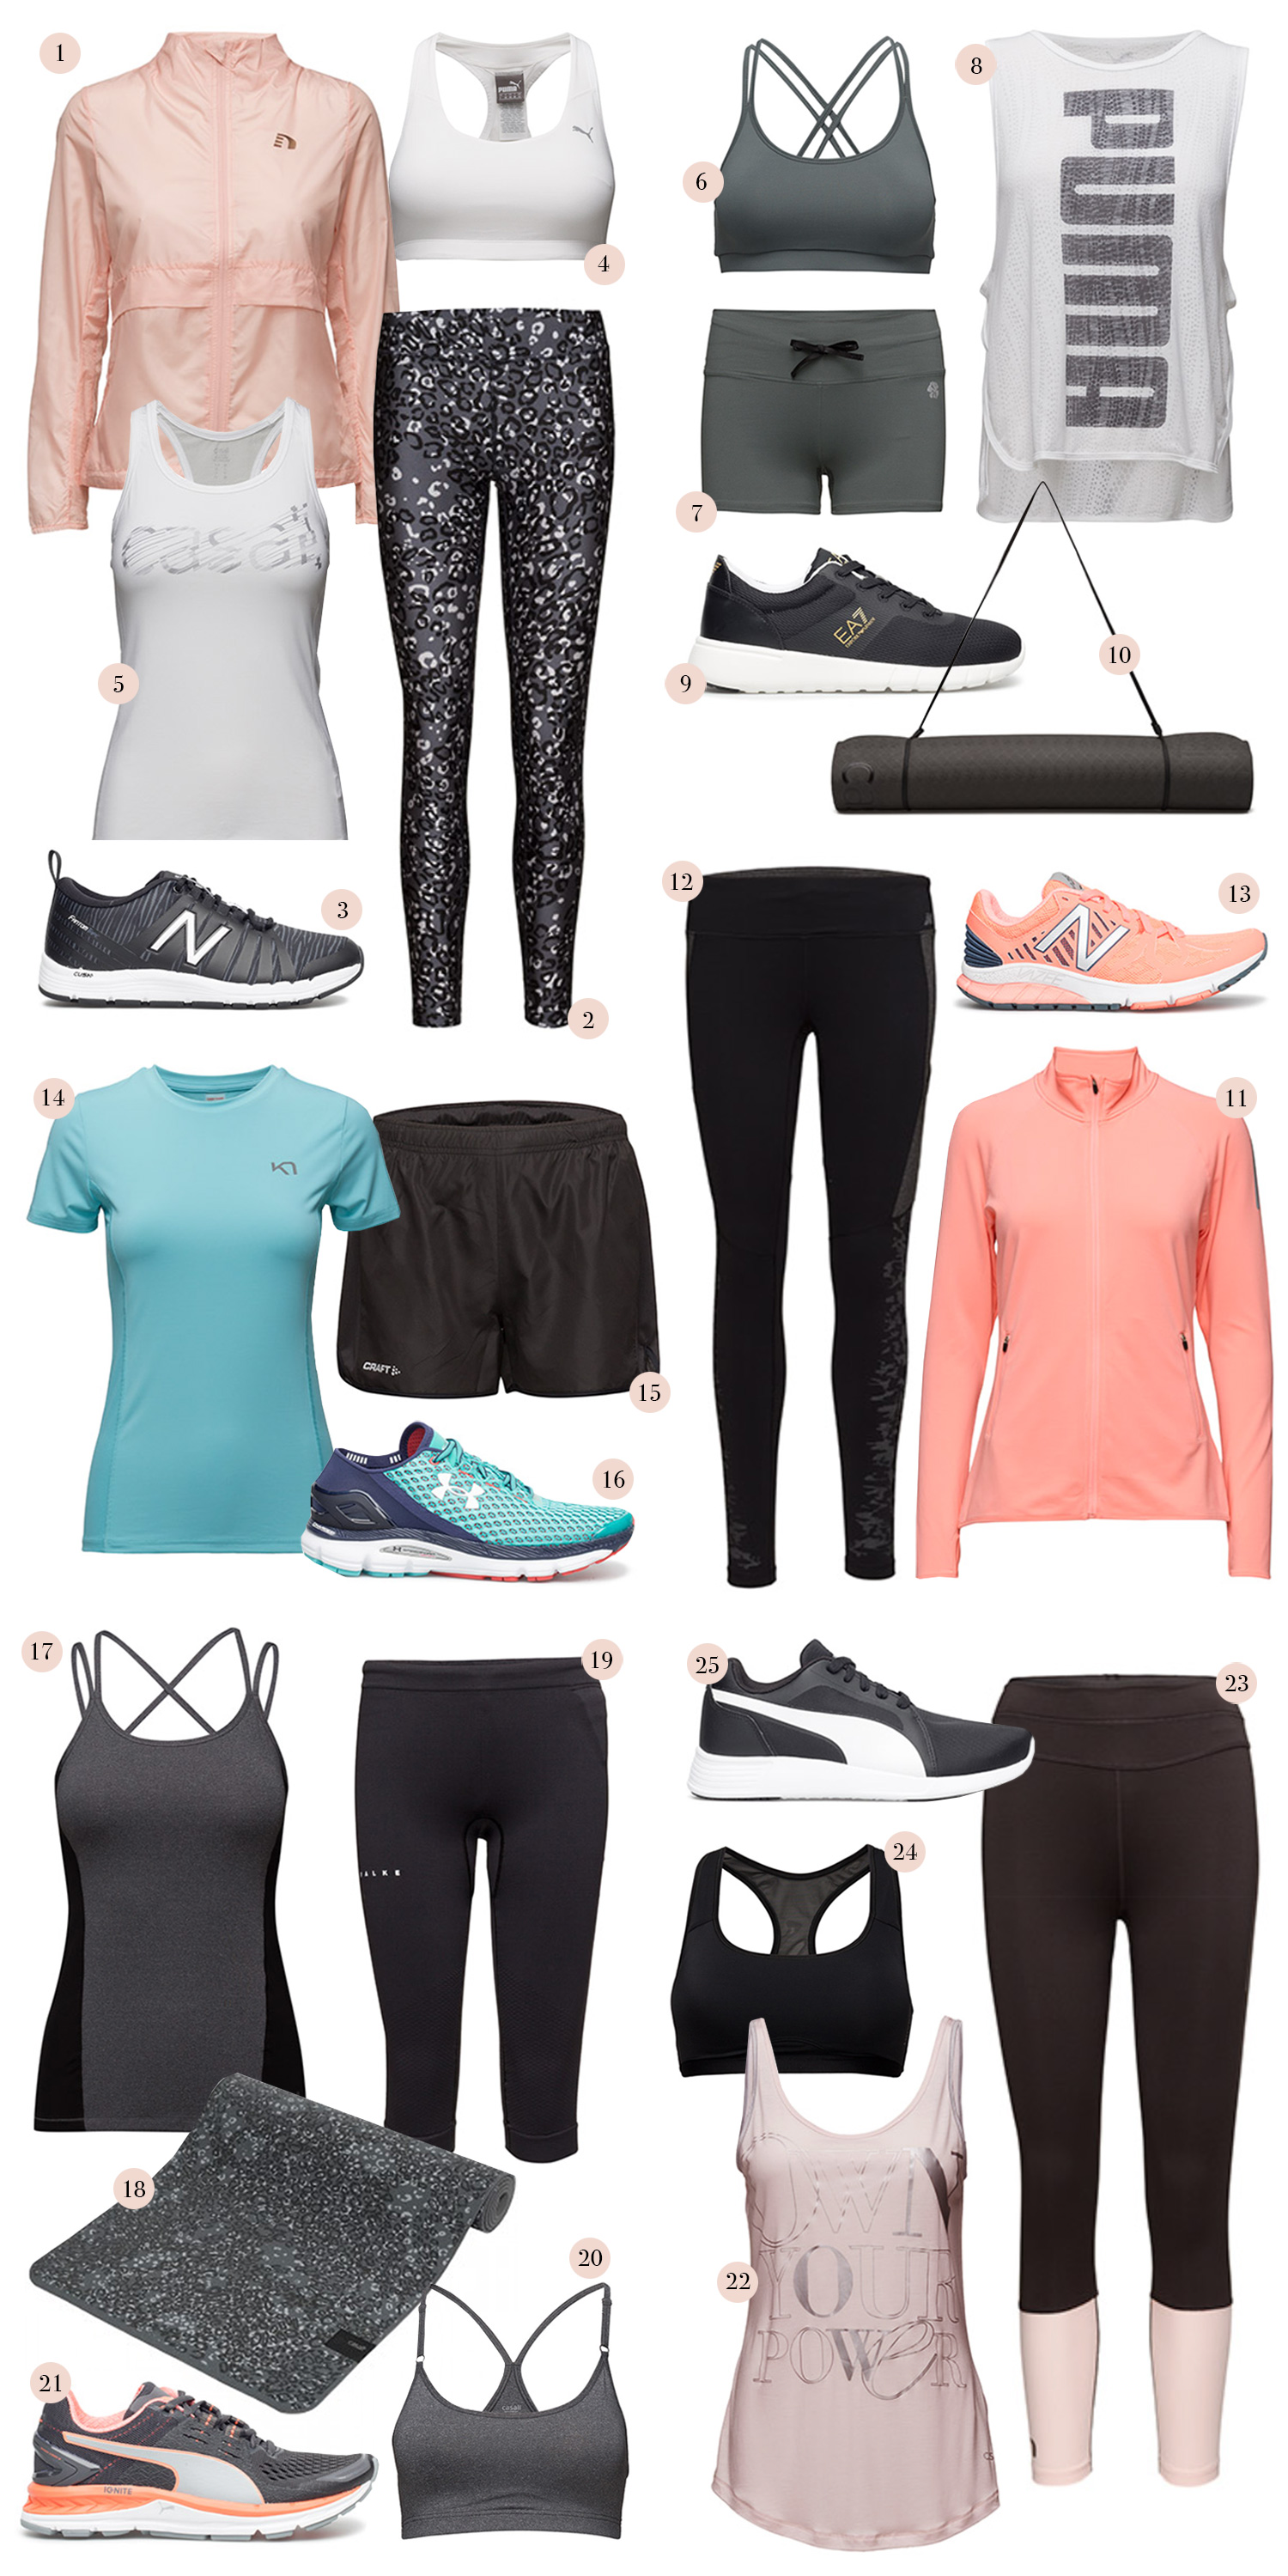 9db8965ff81 Sportswear on sale - Christina Dueholm